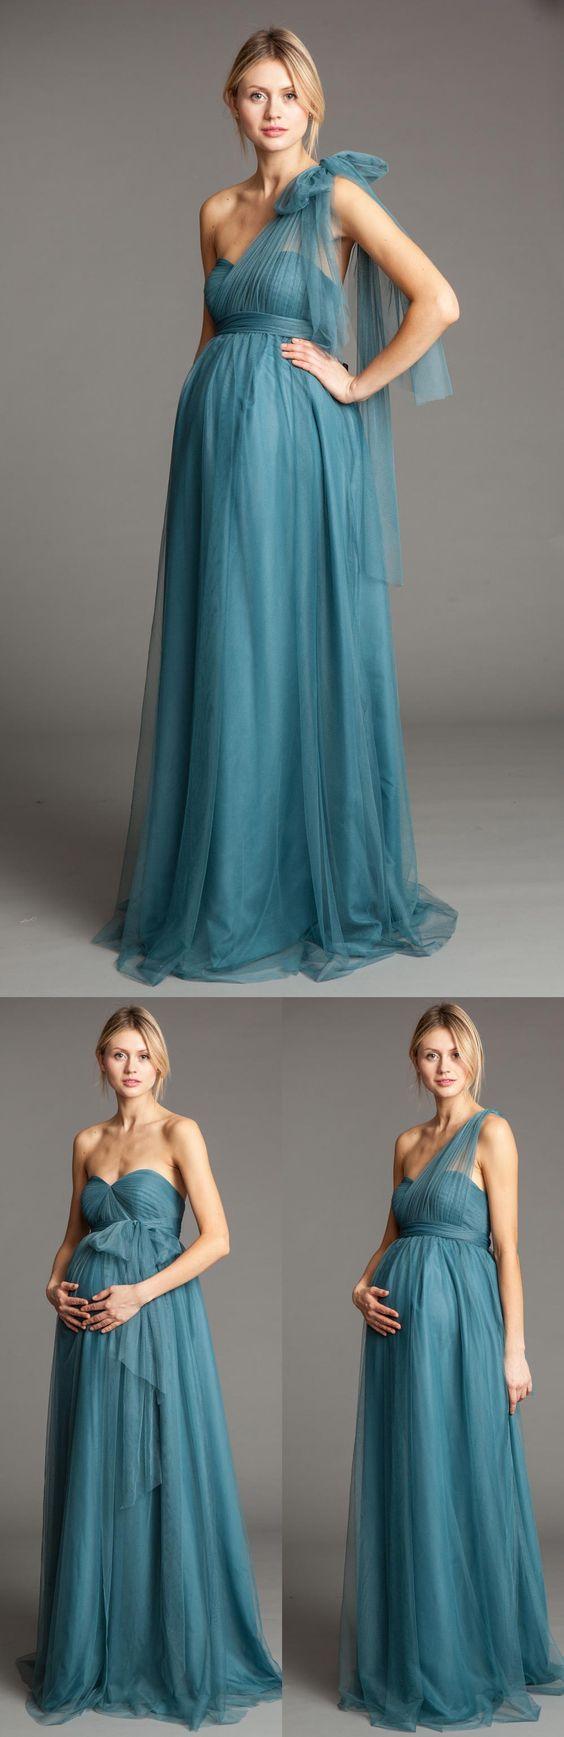 D266 One Shoulder New Fashion Long Pregnant Loaded, Light Blue ...